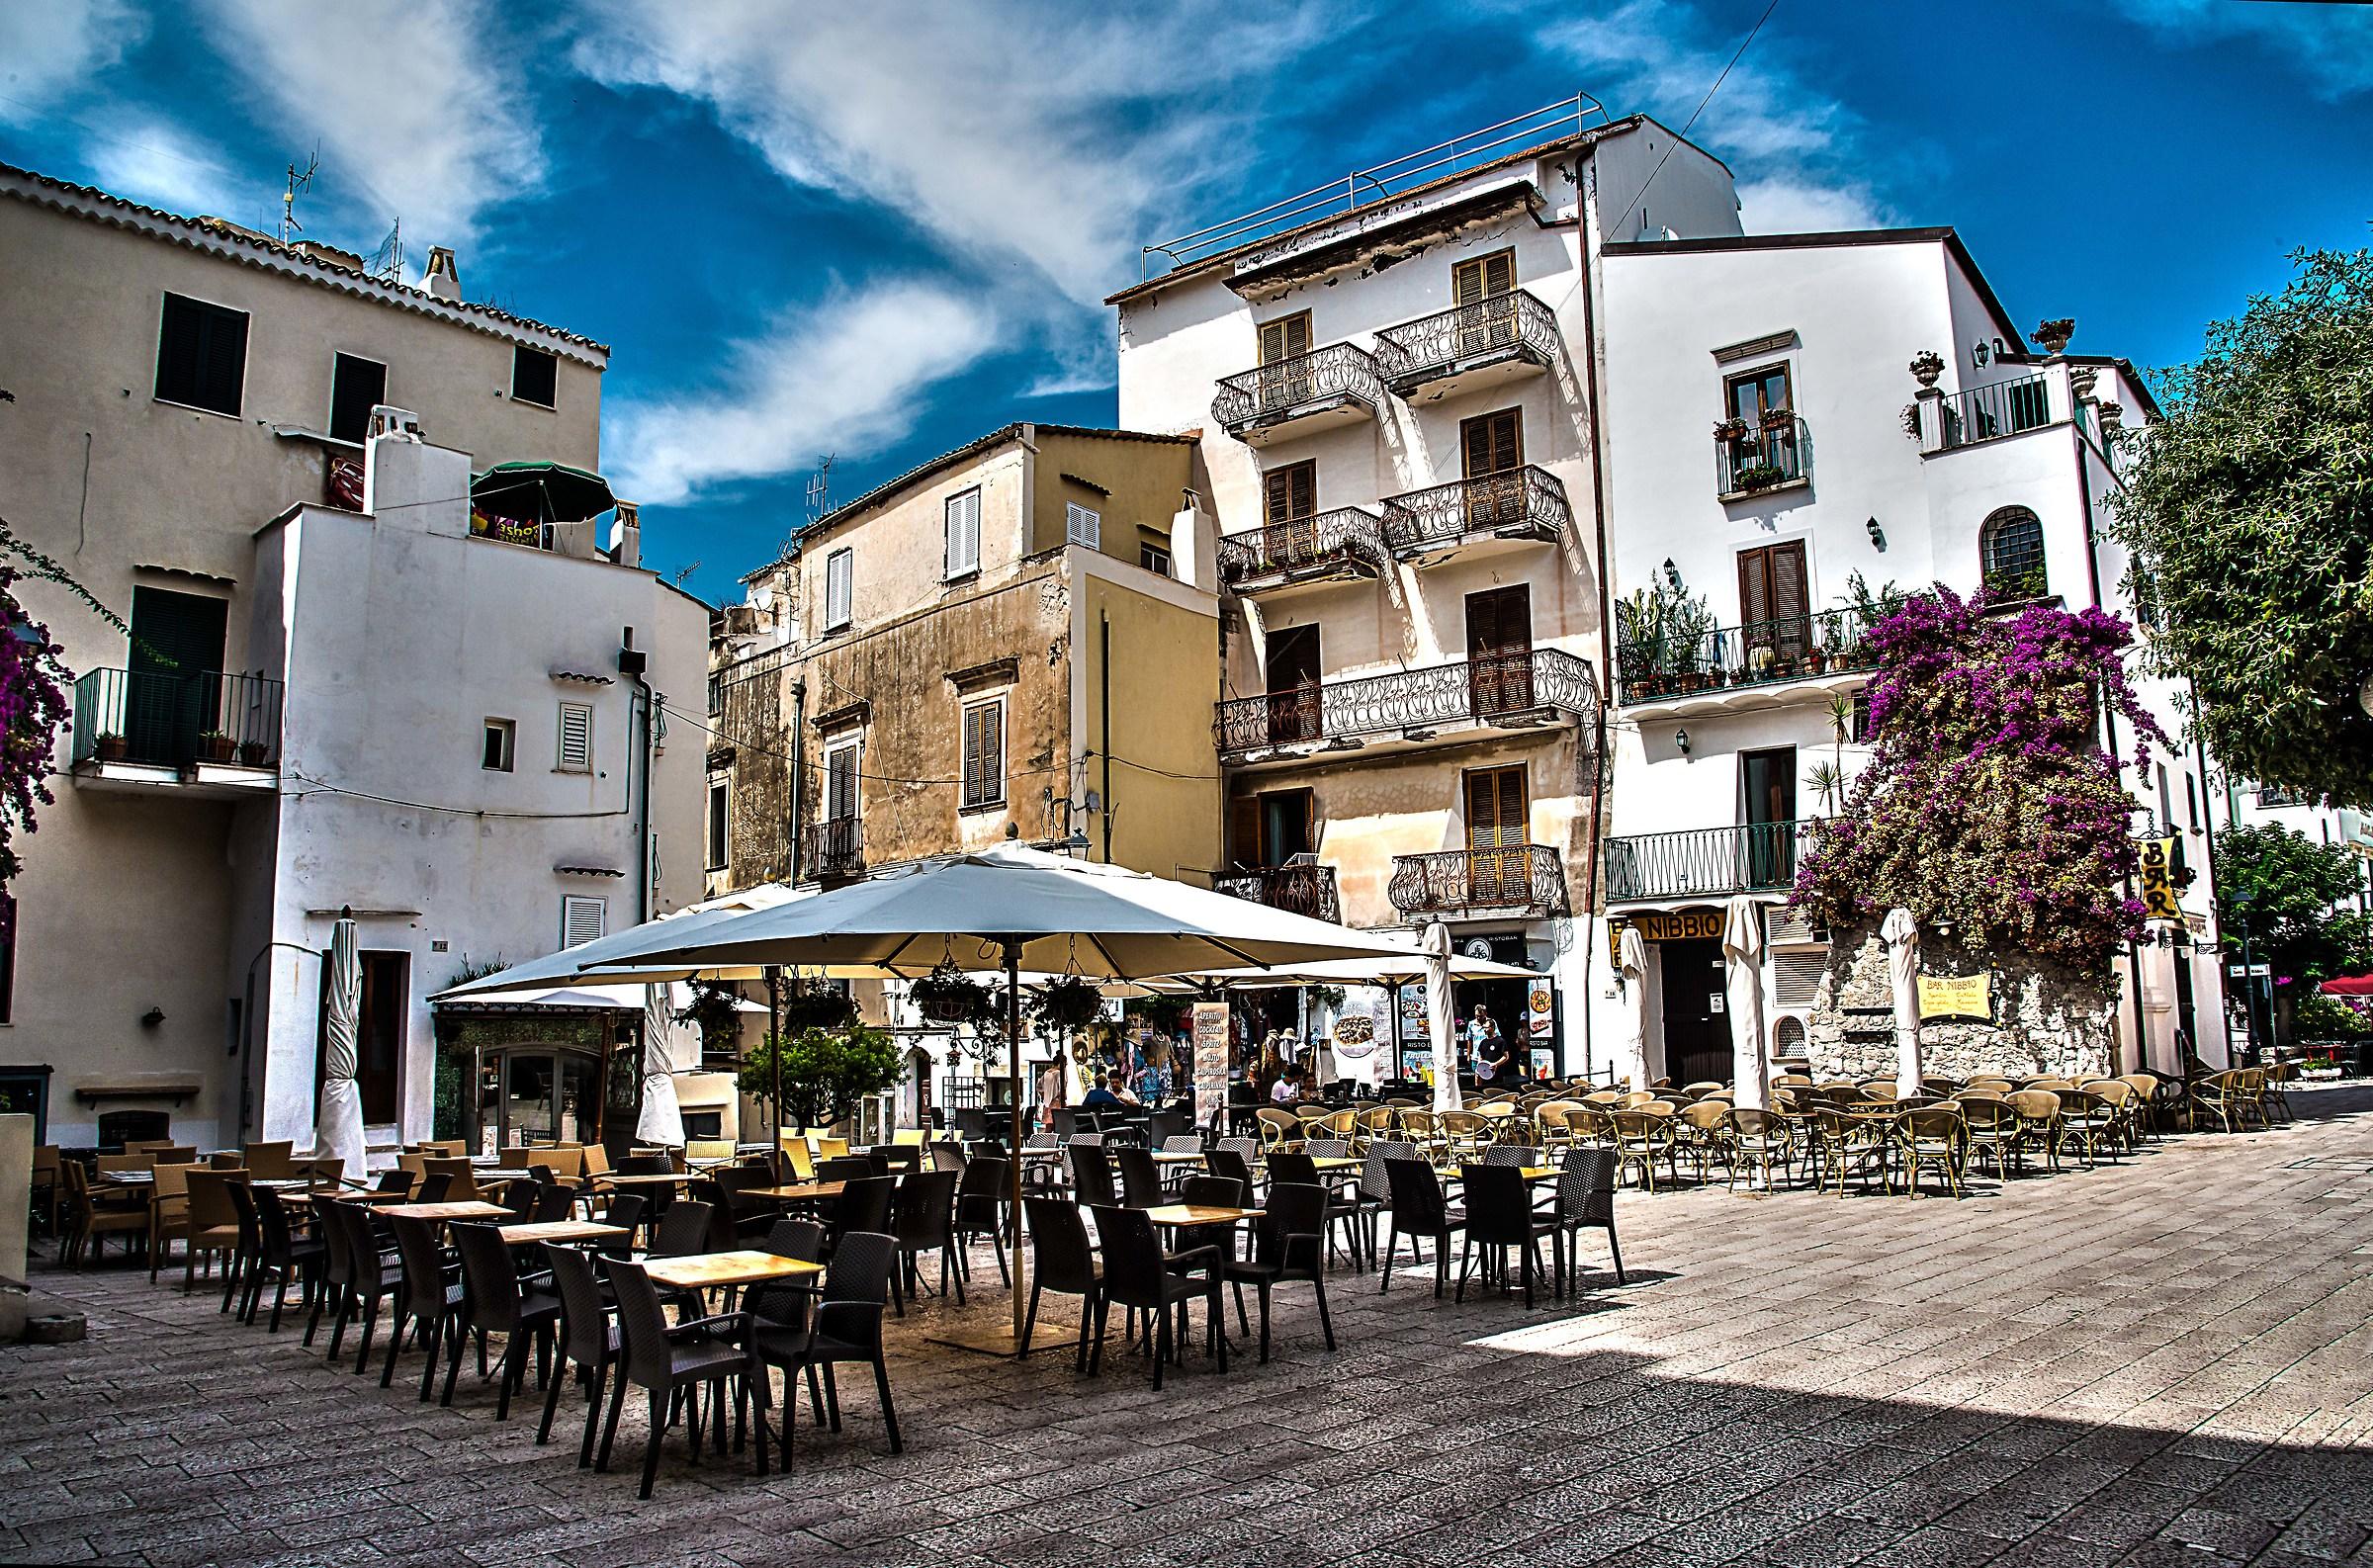 The square of Sperlonga...